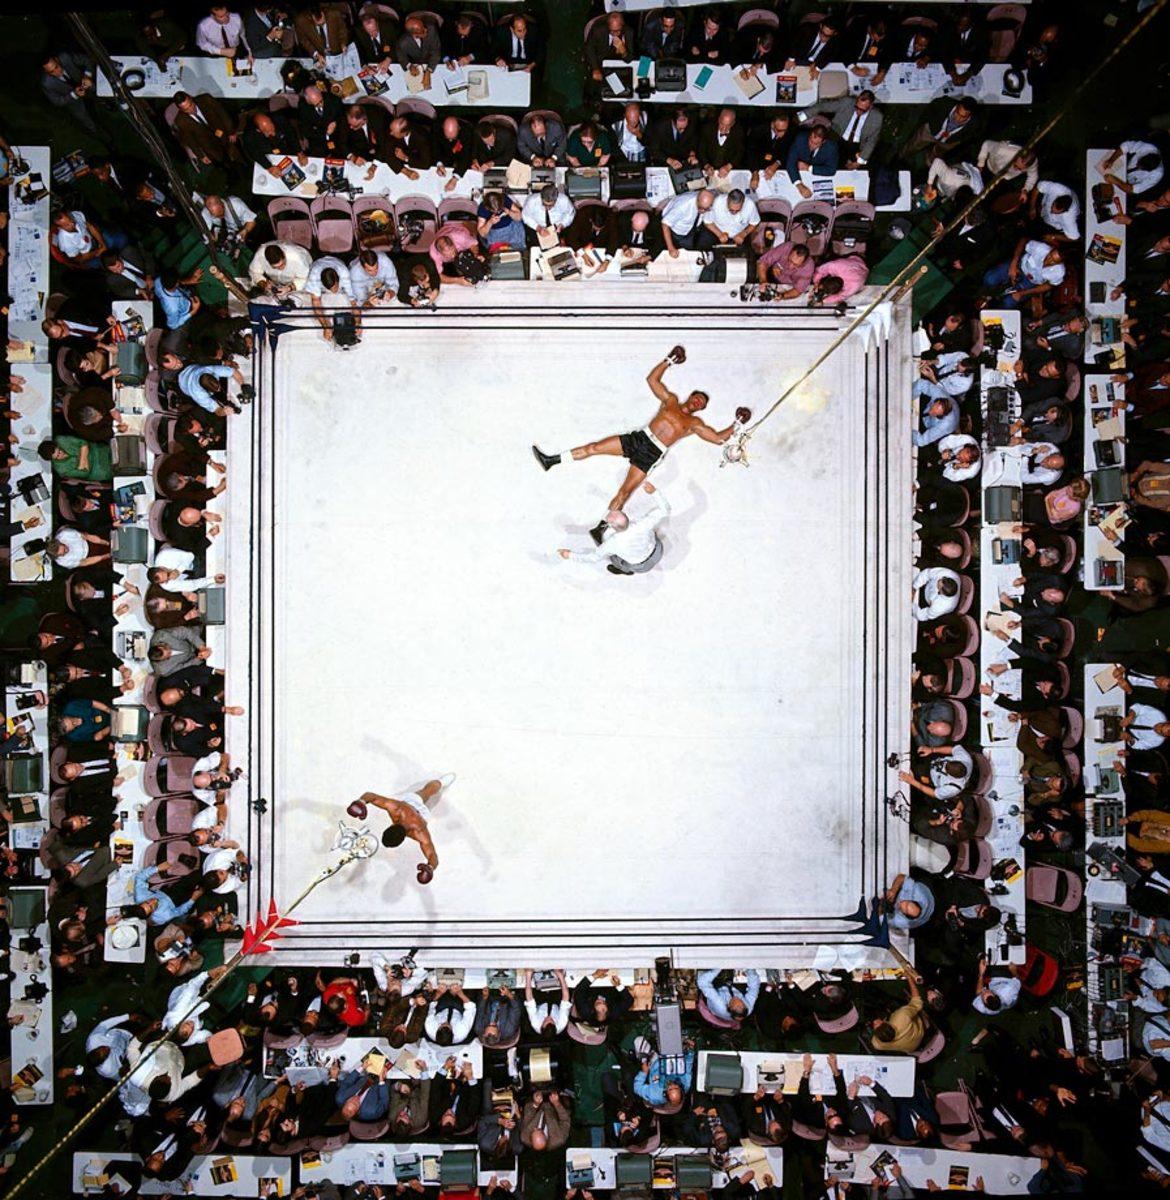 1966-1114-Muhammad-Ali-Cleveland-Williams-001339166.jpg